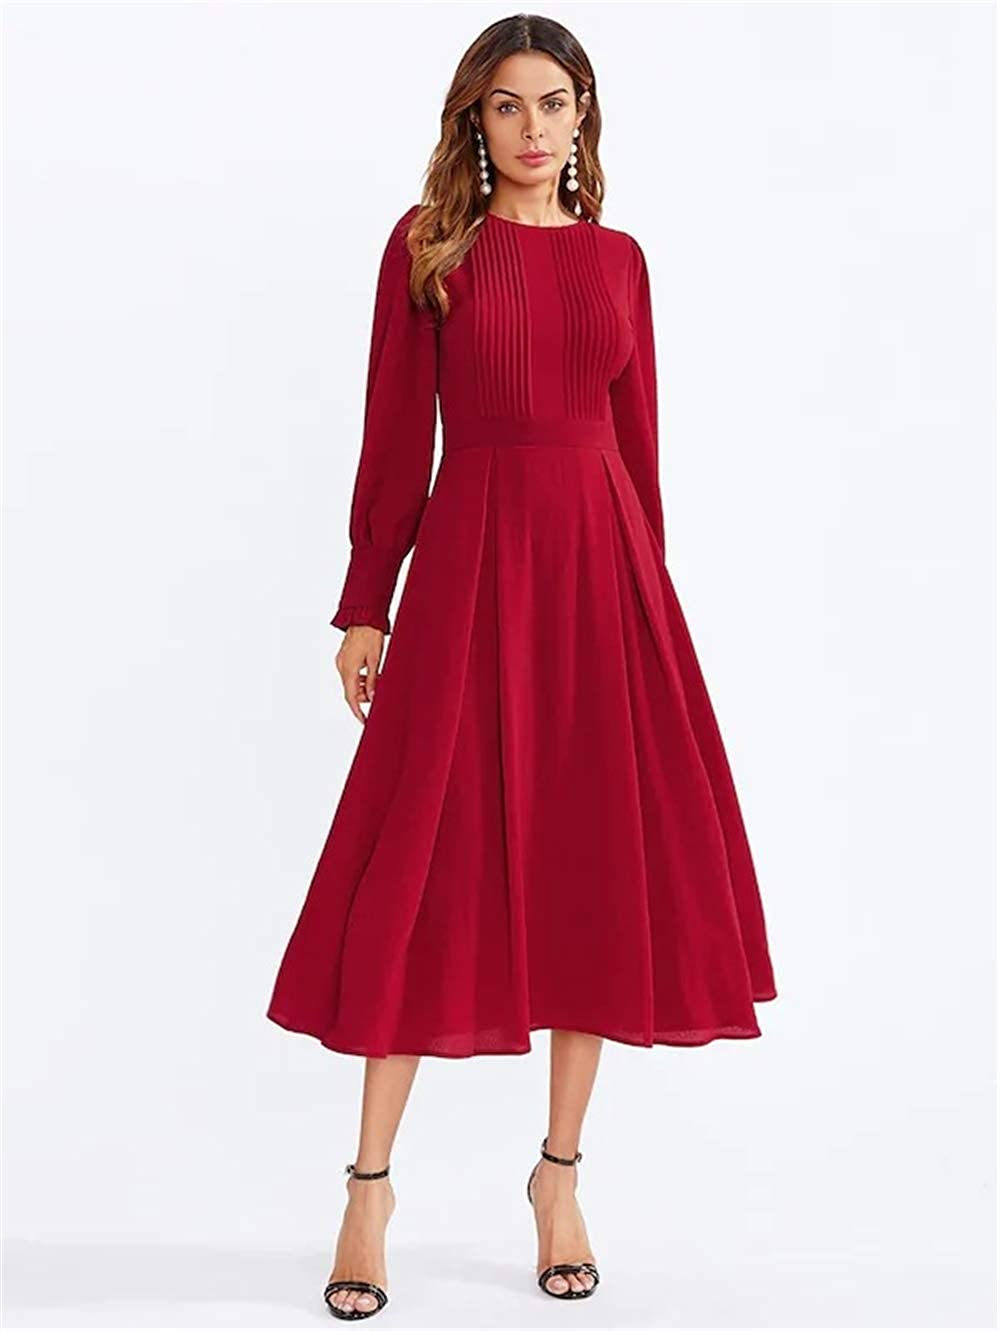 Shanenxn Women Solid Long Sleeve Cowl Neck Maxi Dress Vintage Pocket Dresses Casual